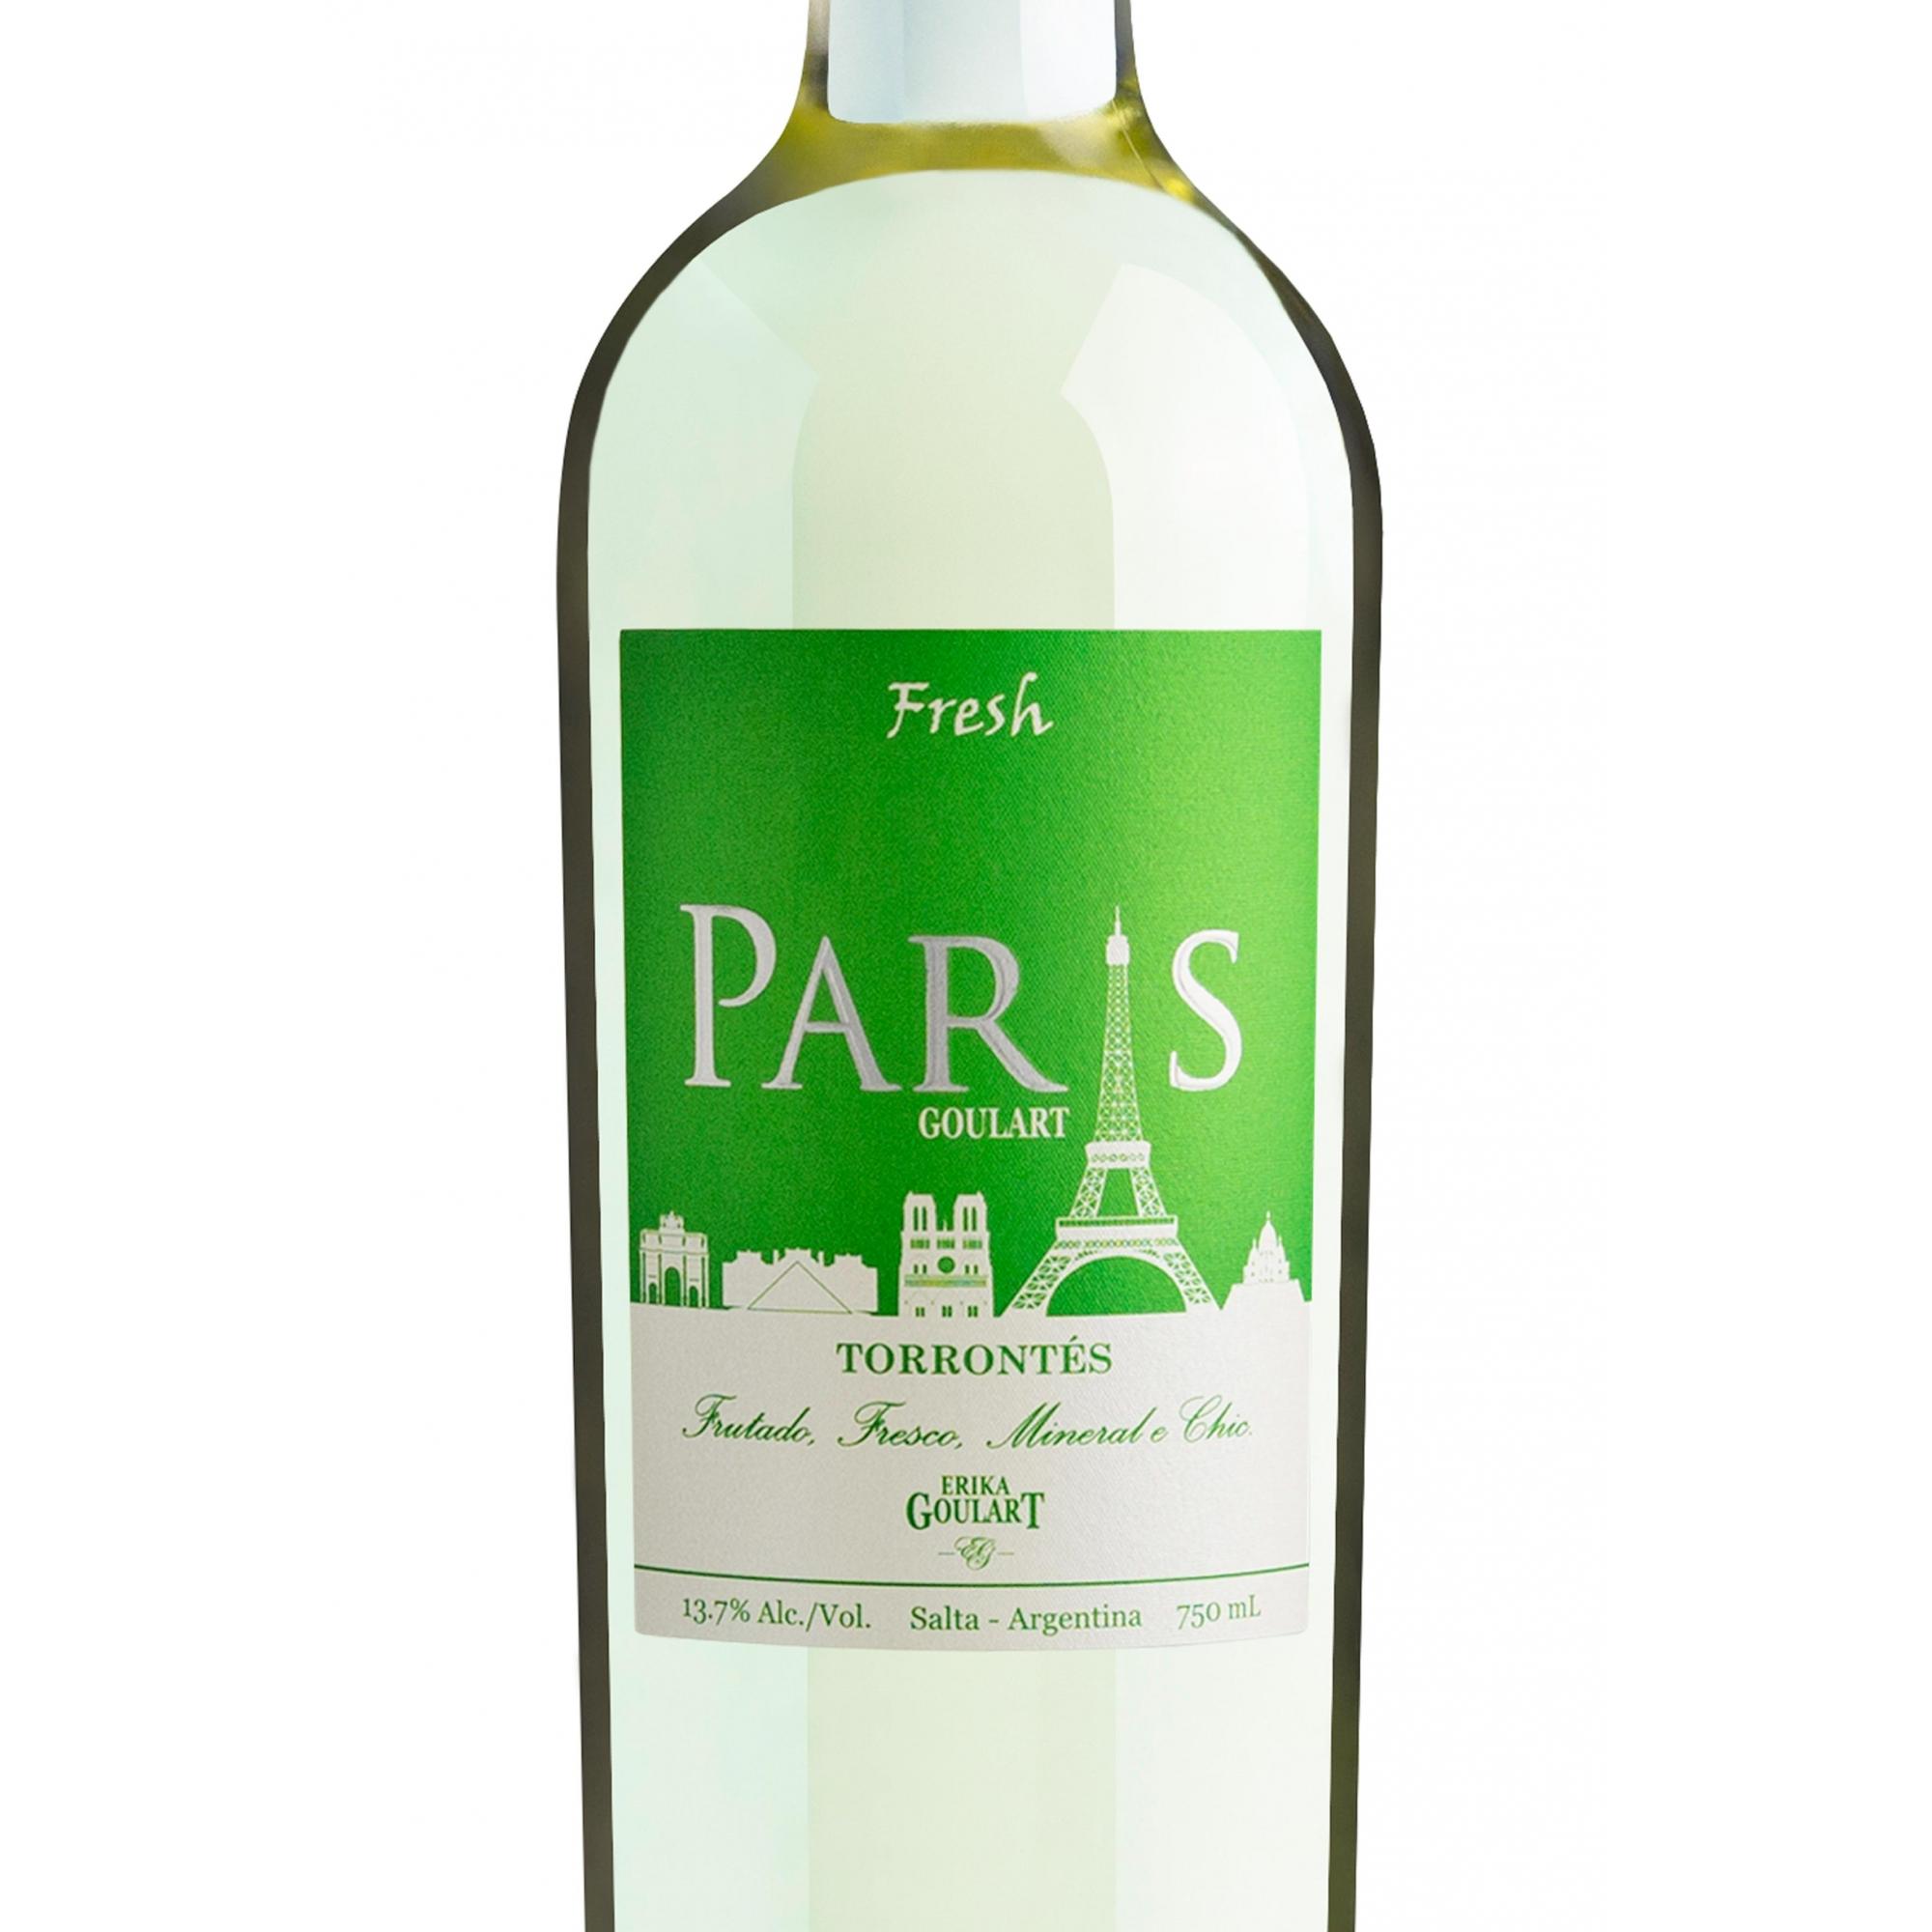 Paris Goulart Fresh Torrontés 2020 - 750ml